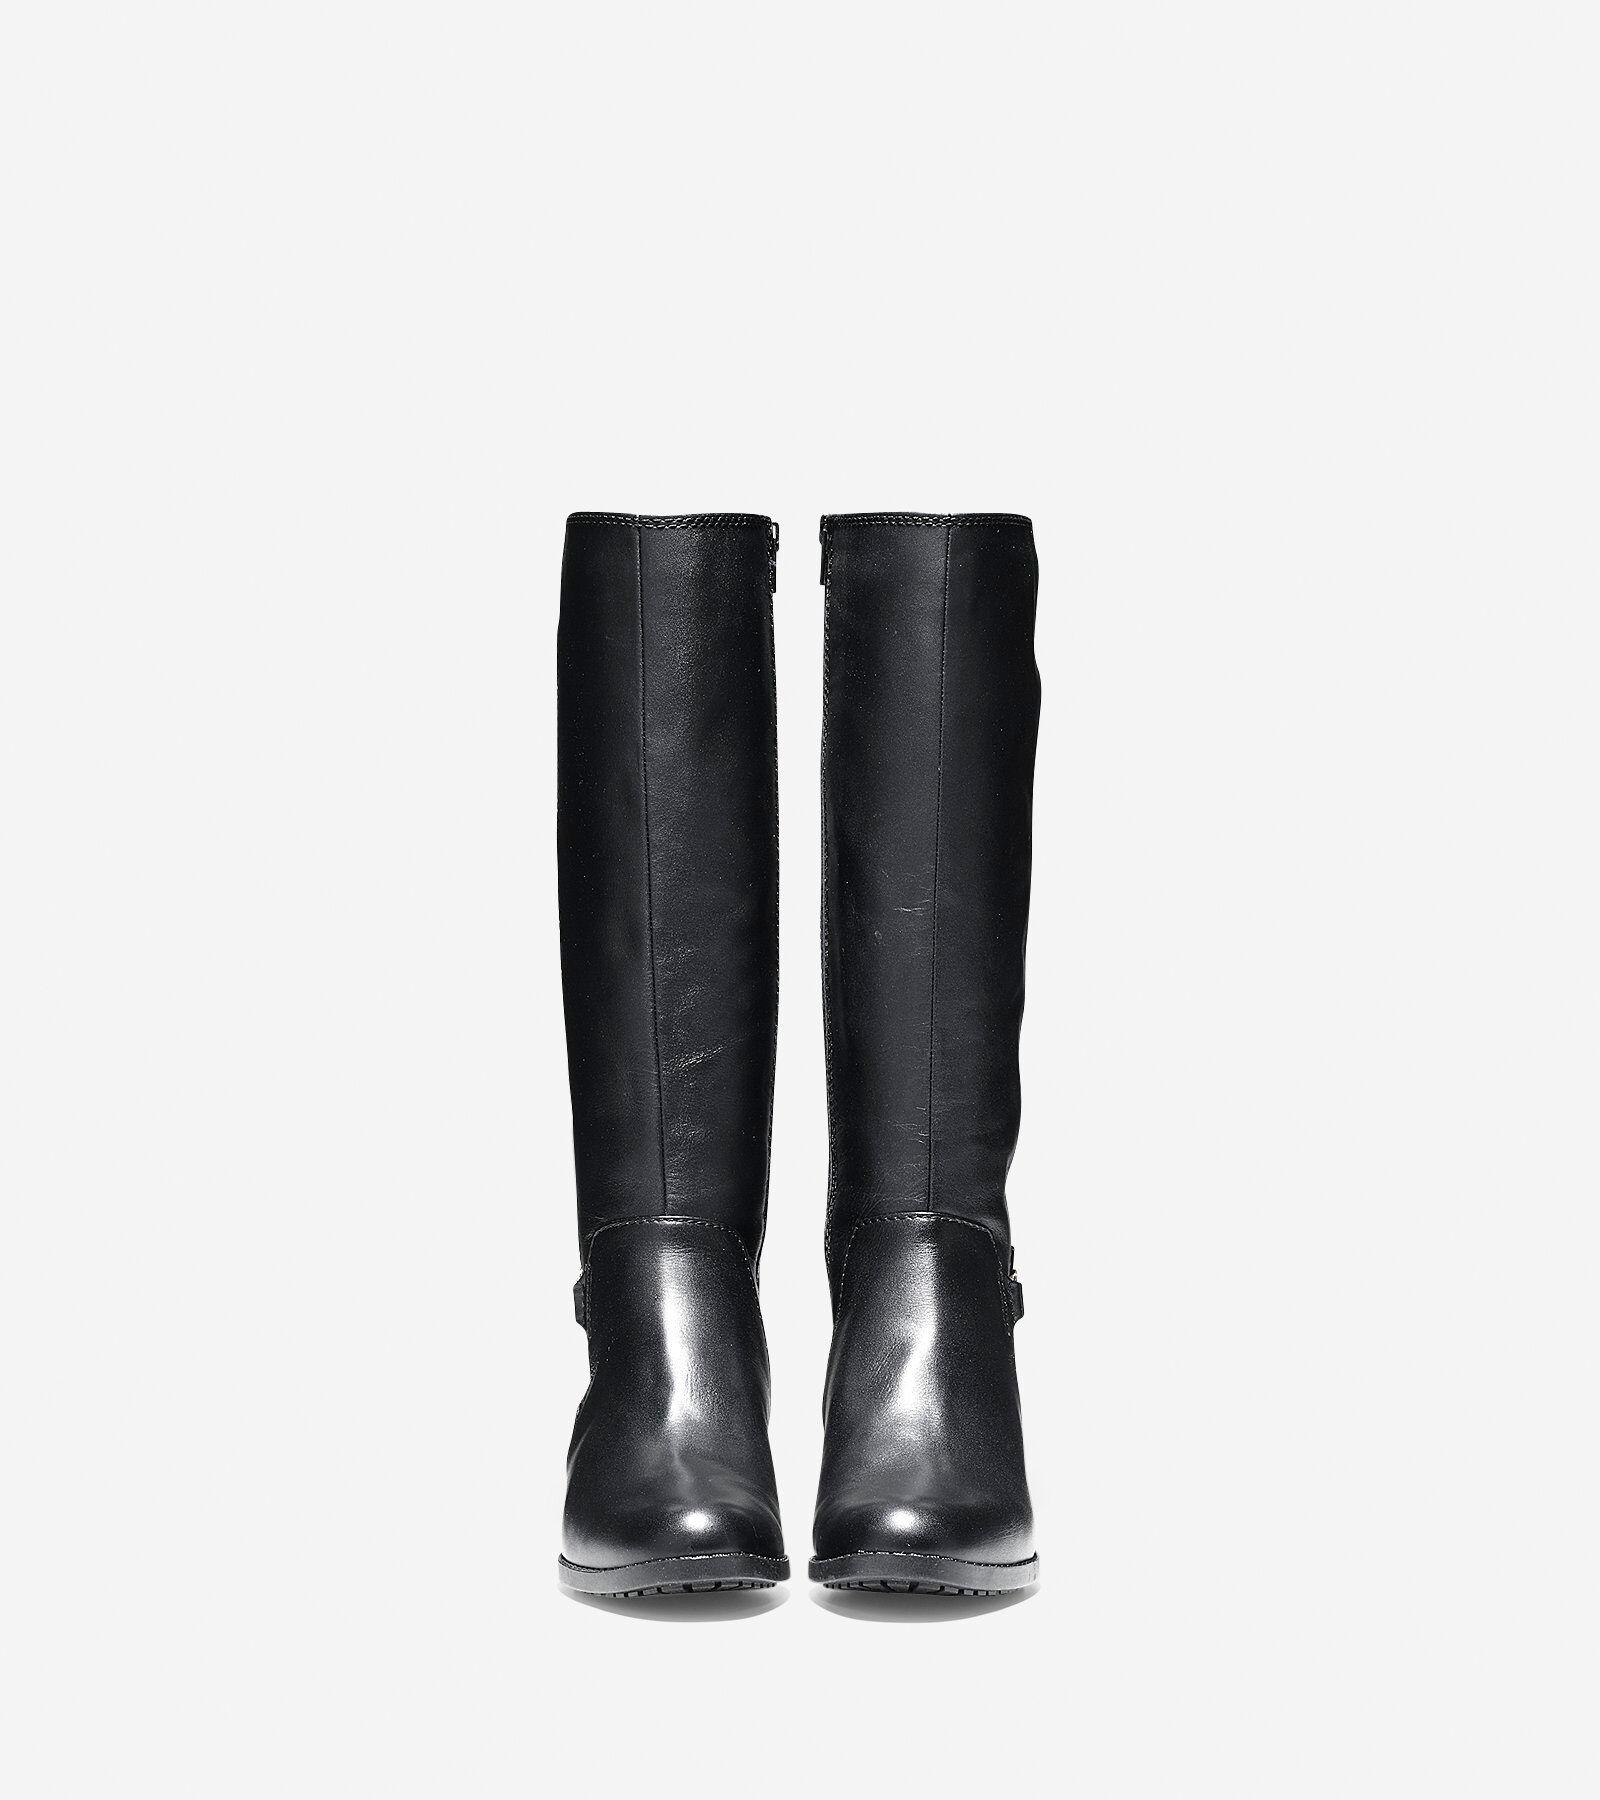 Evren Waterproof Boot Cole Haan nCpF3zlq0A